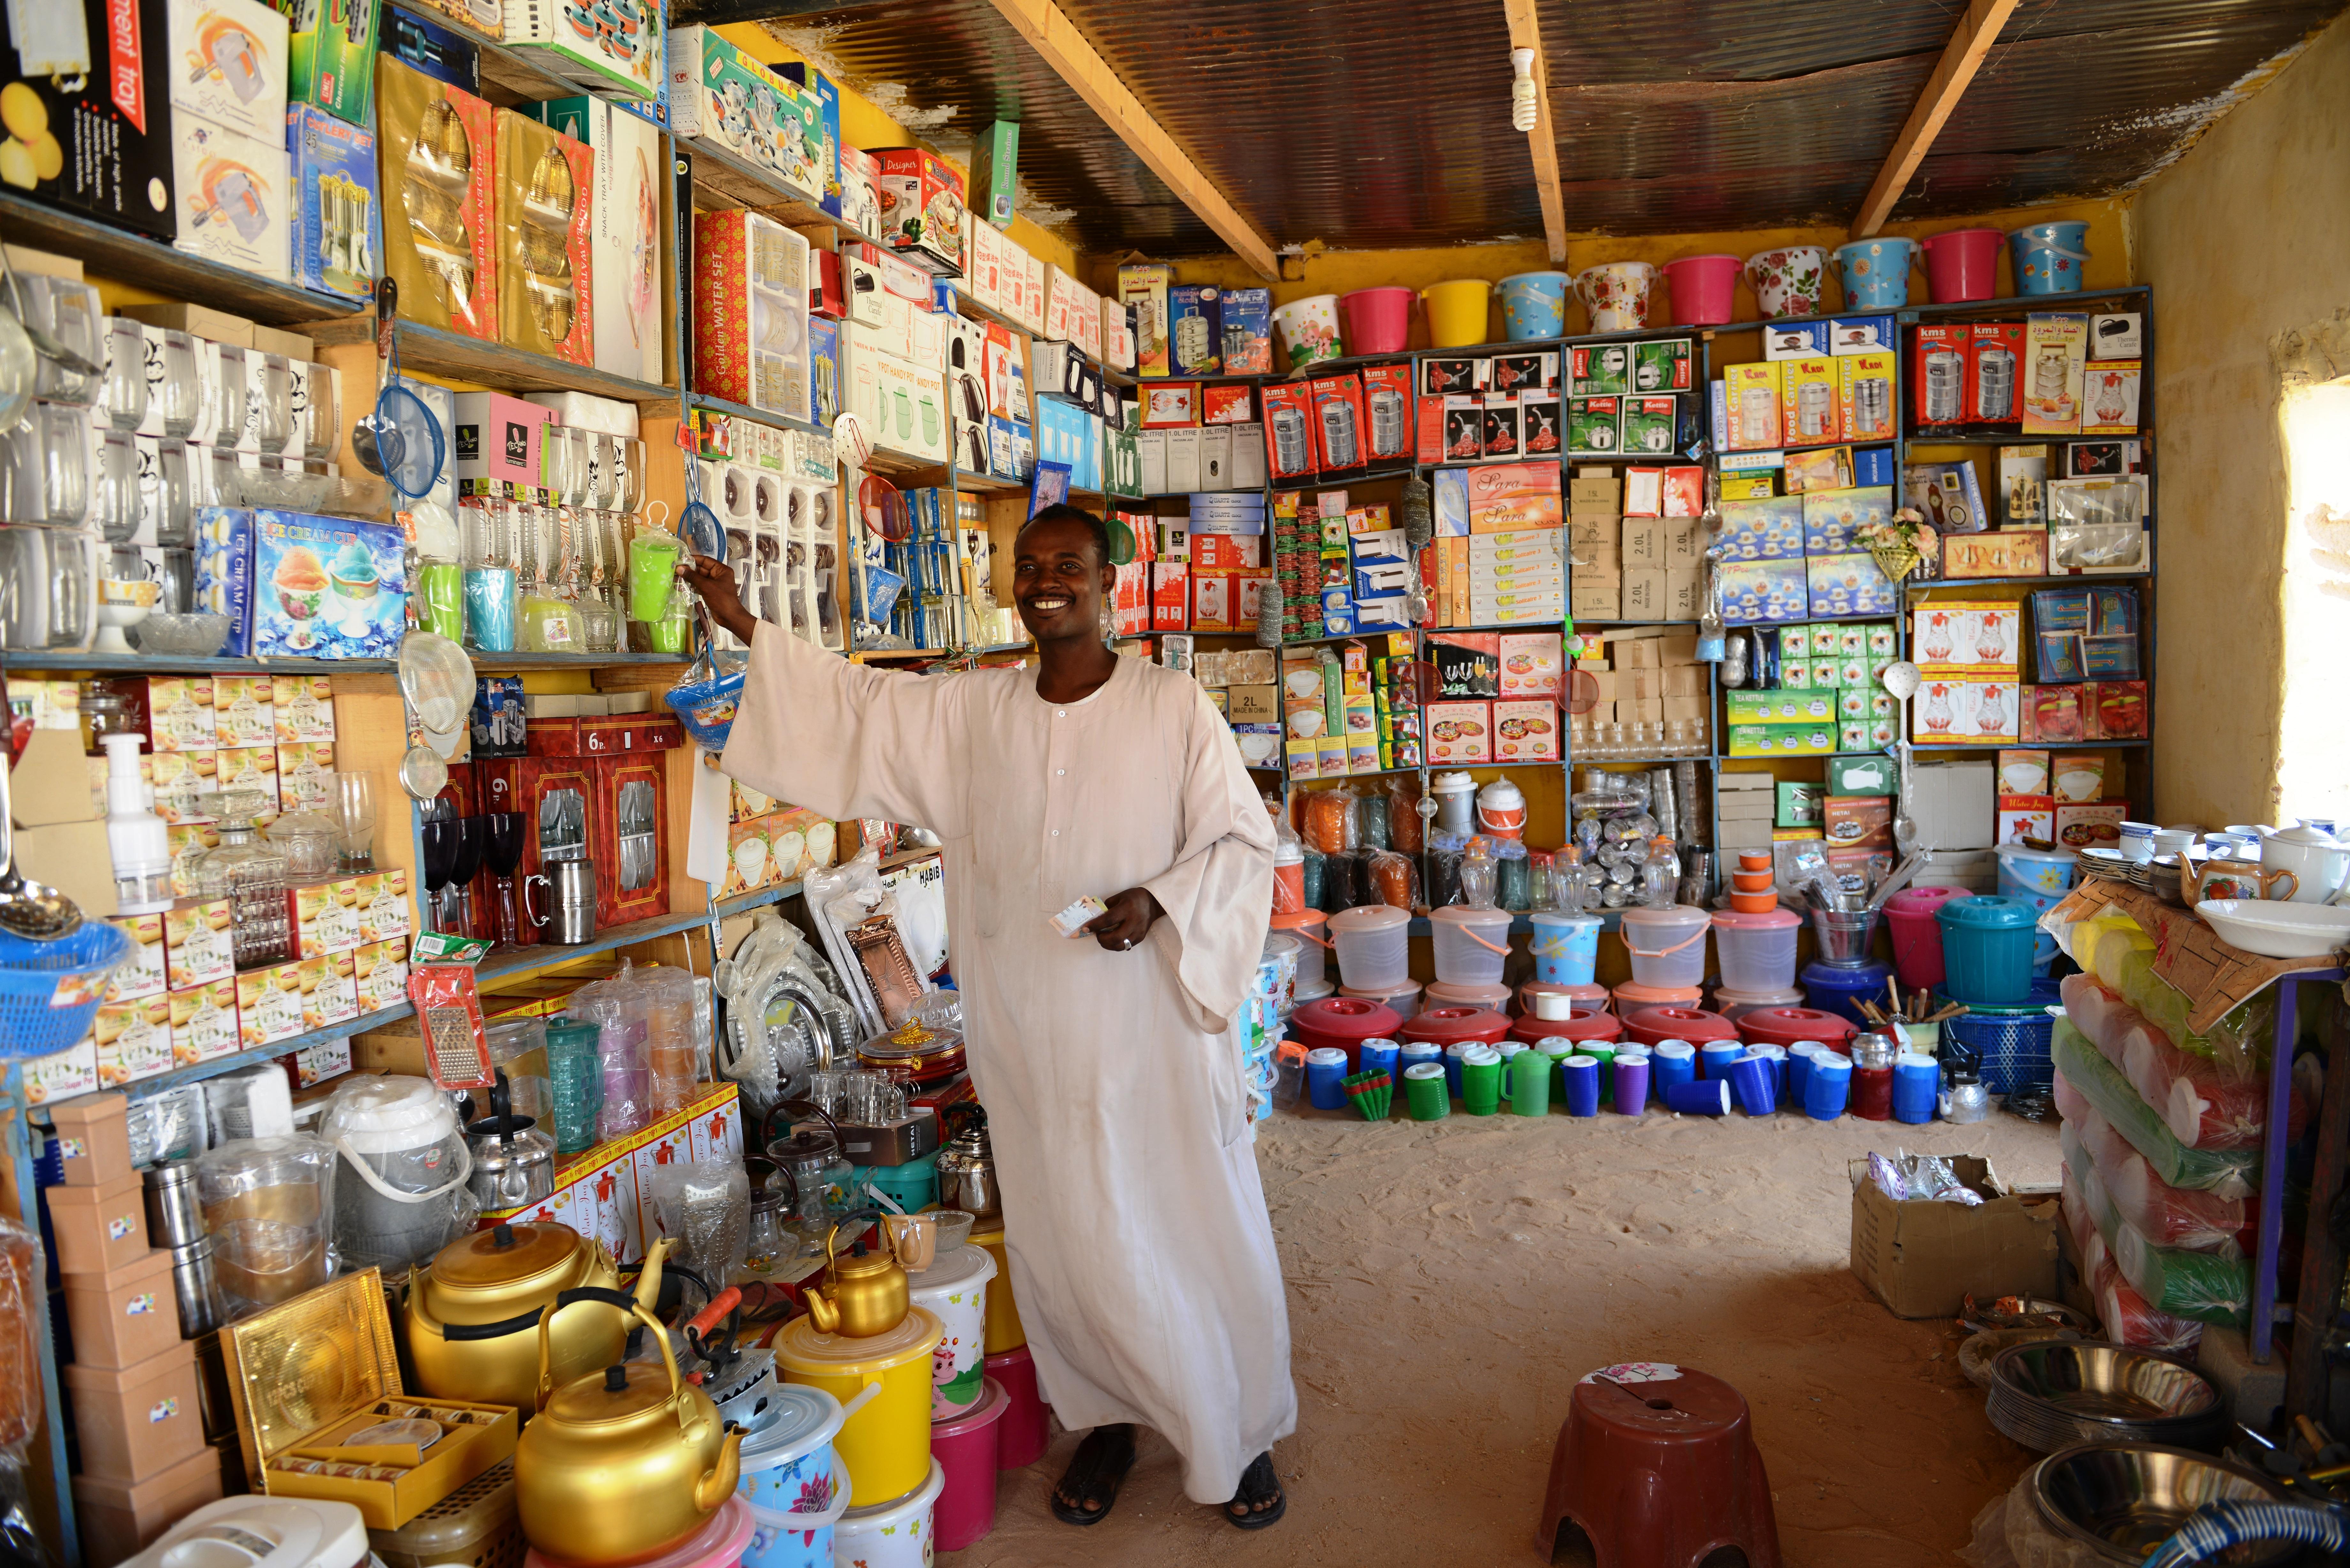 Sudan (25. September – 3. Oktober 2012)